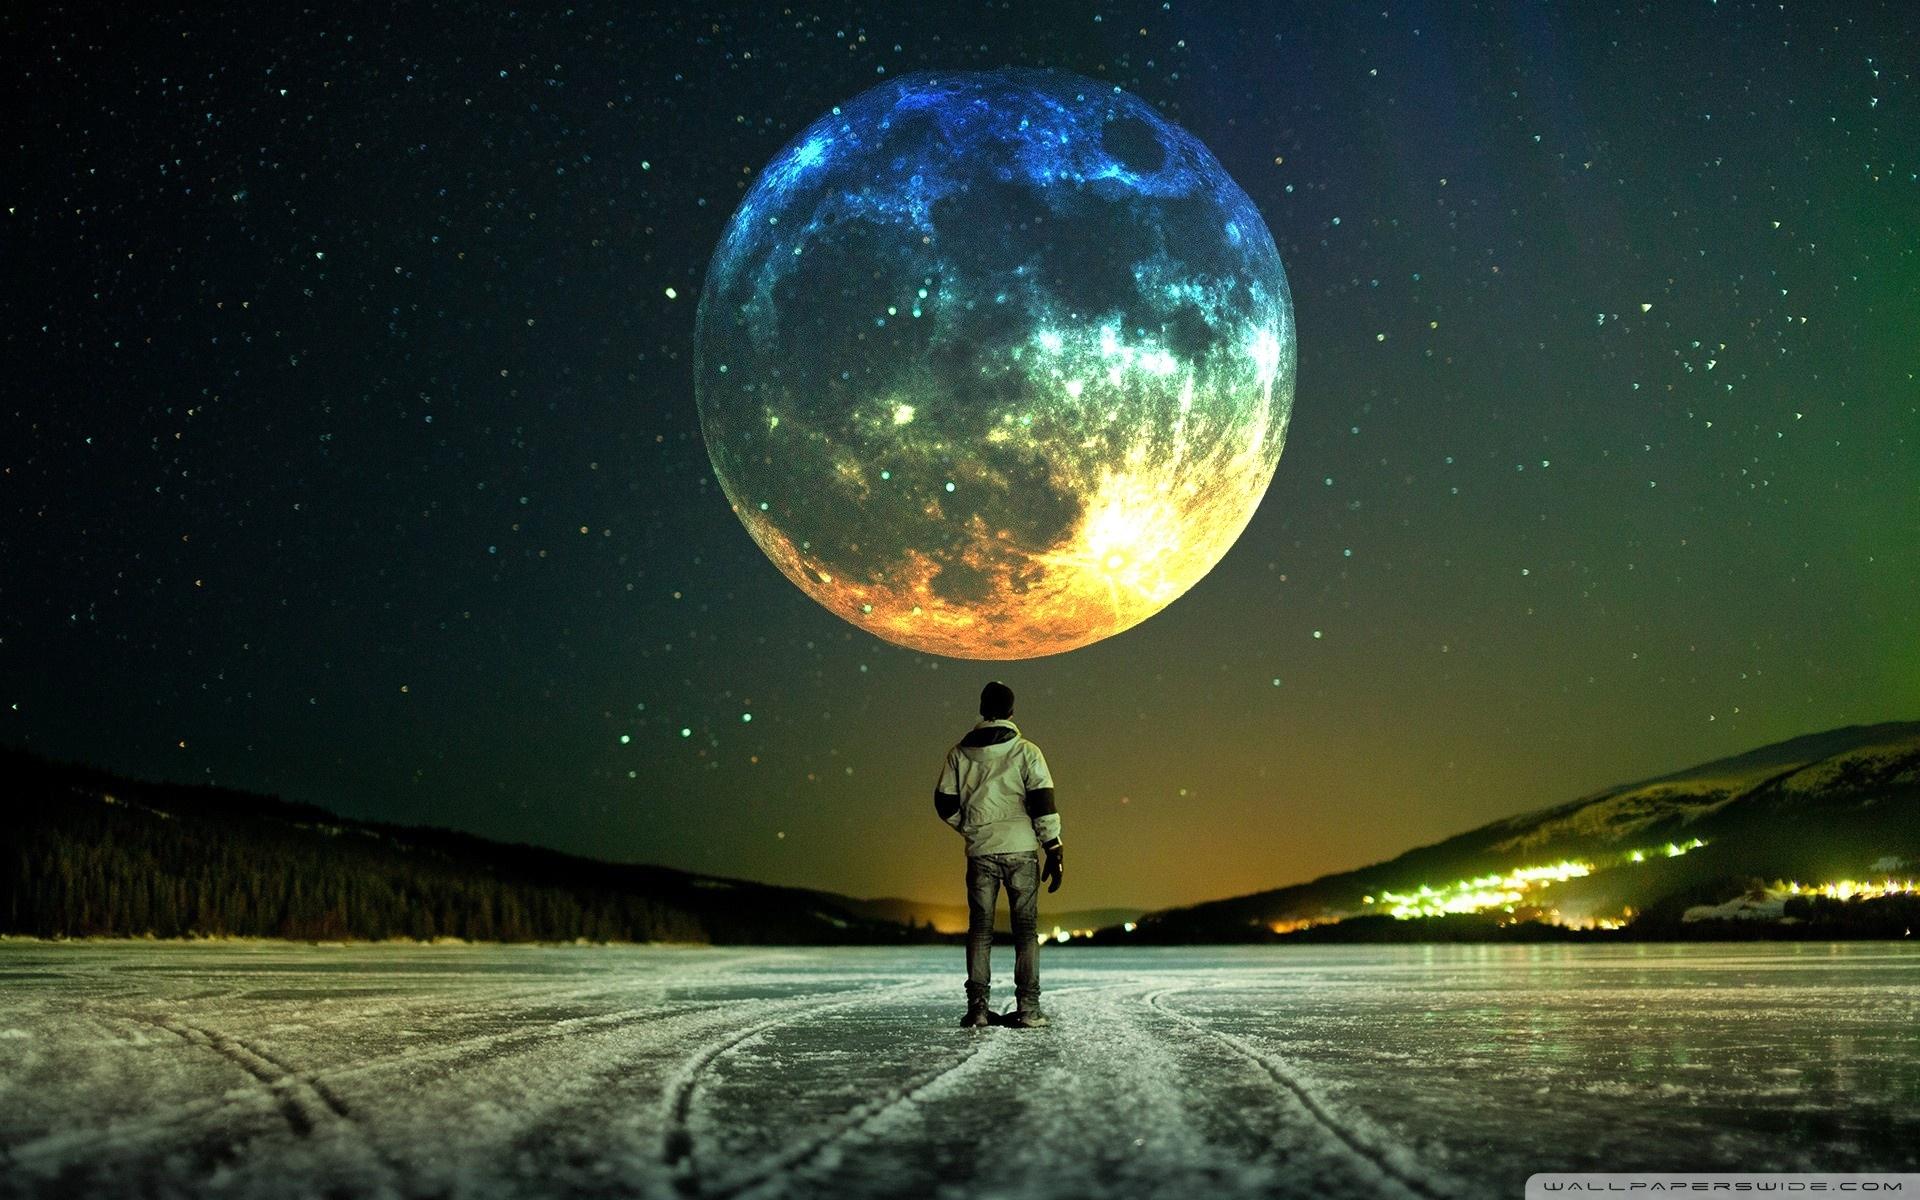 full moon ❤ 4k hd desktop wallpaper for 4k ultra hd tv • tablet